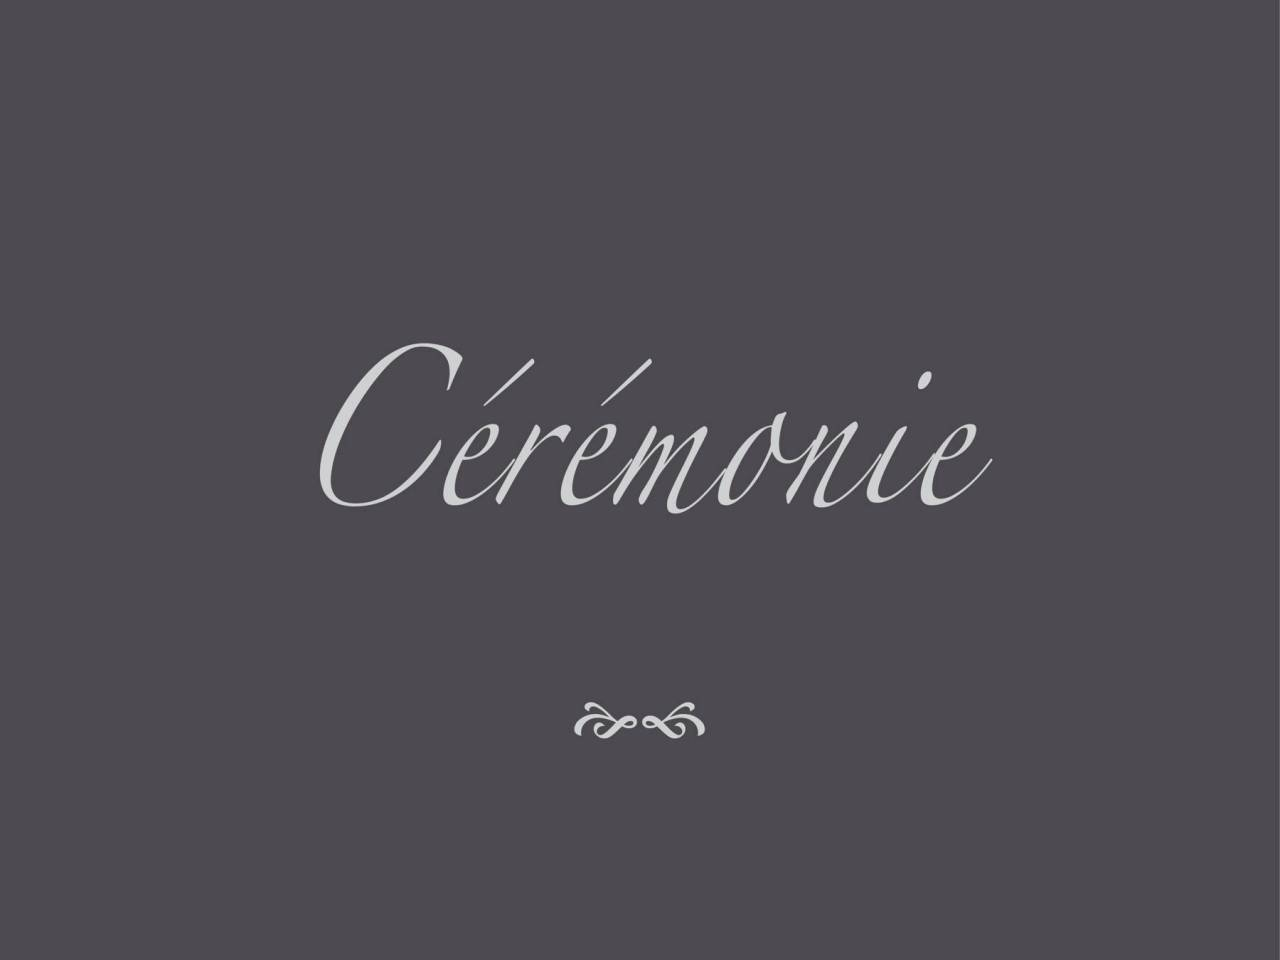 ceremonies_02